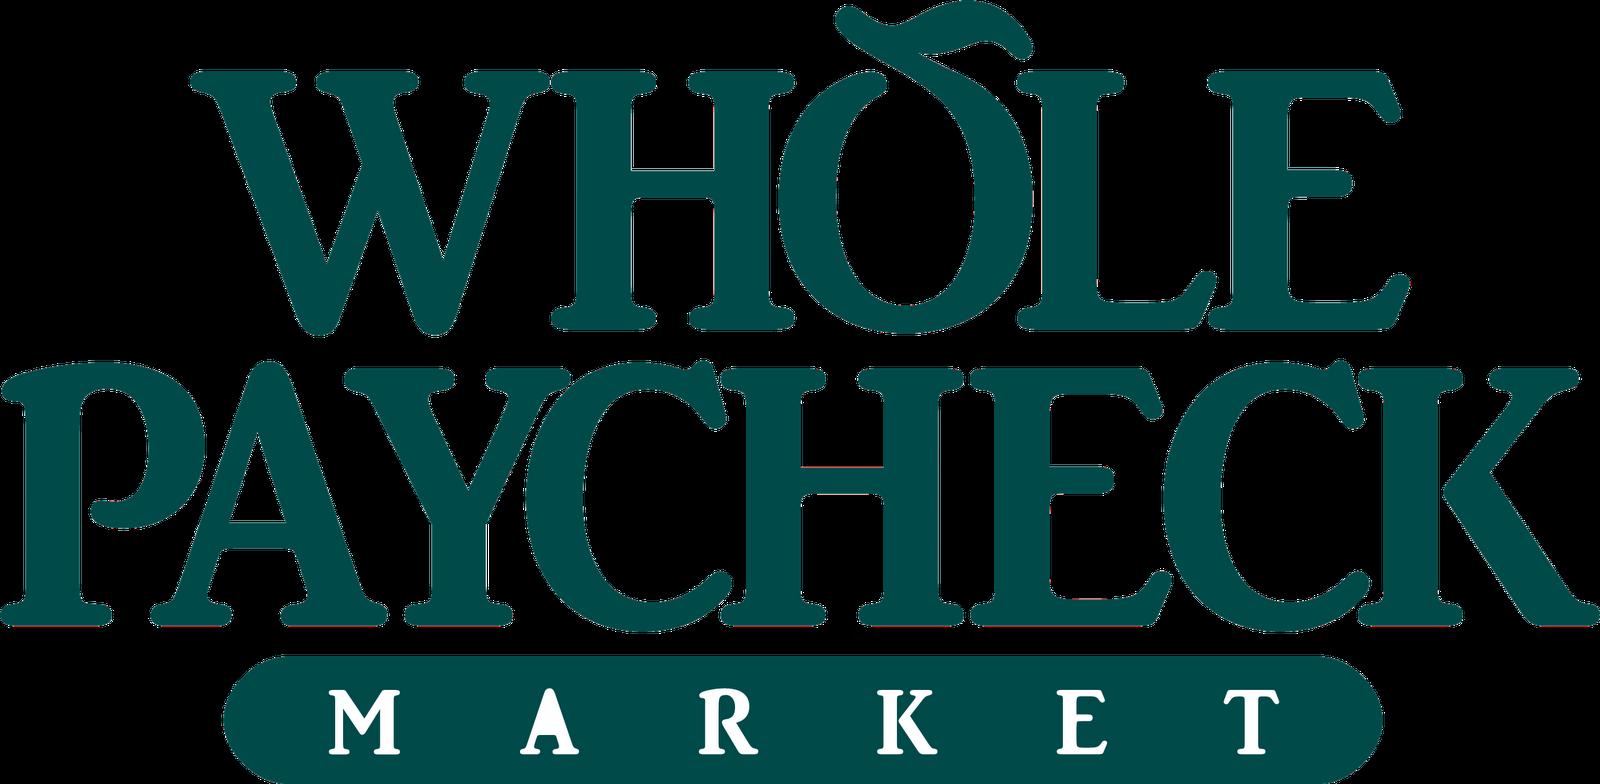 Whole Foods Wants To Shake Free Of A Negative Narrative Whole Food Recipes Budget Meals Shop Whole Foods